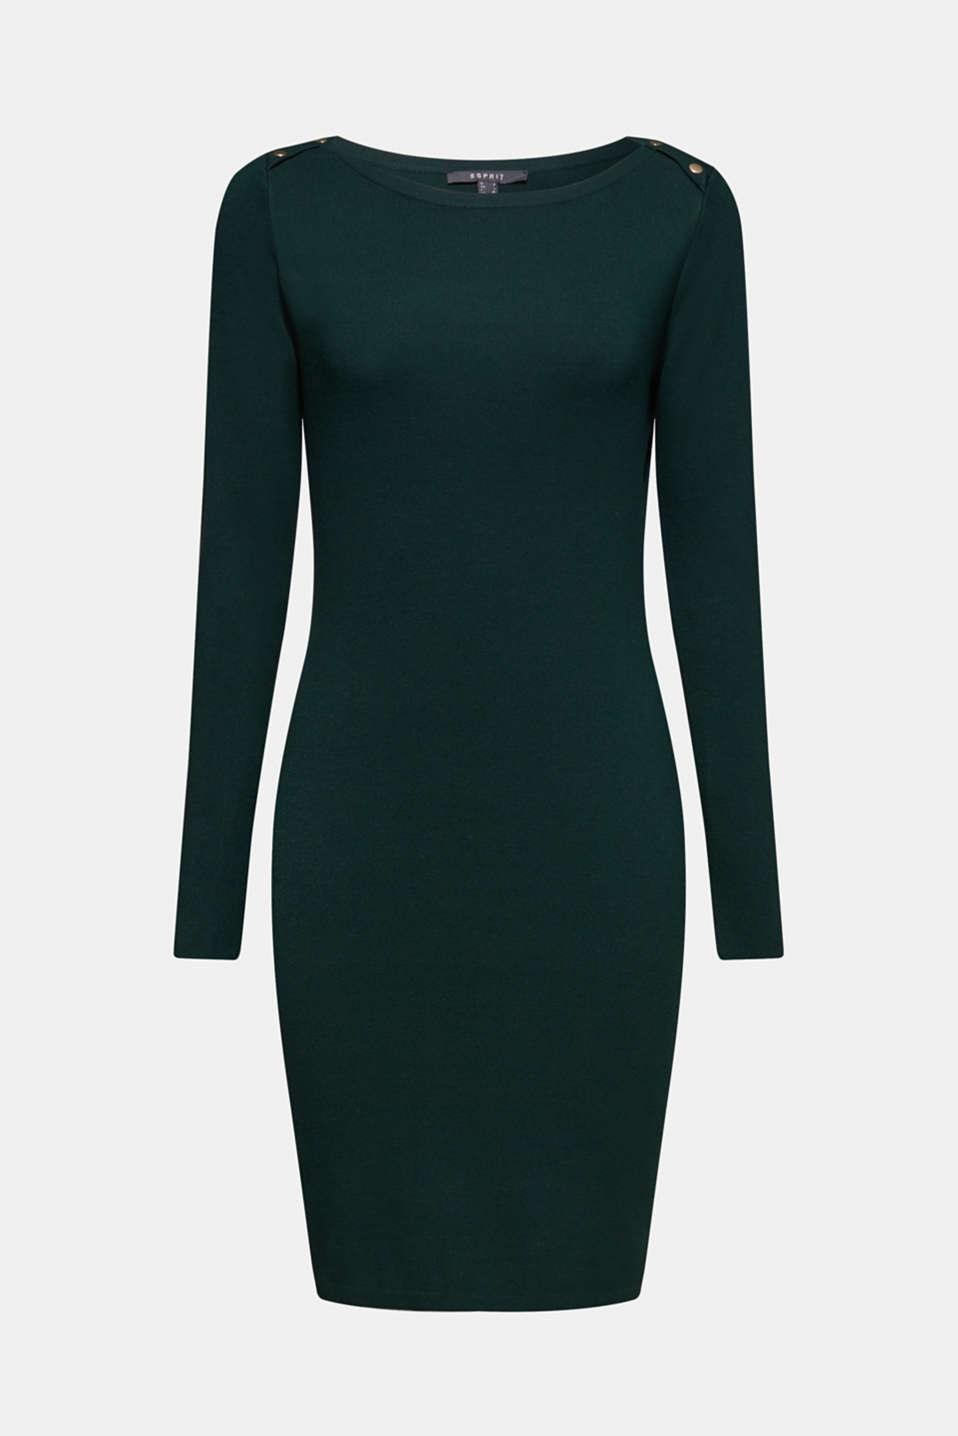 Fine-knit sheath dress, BOTTLE GREEN, detail image number 6